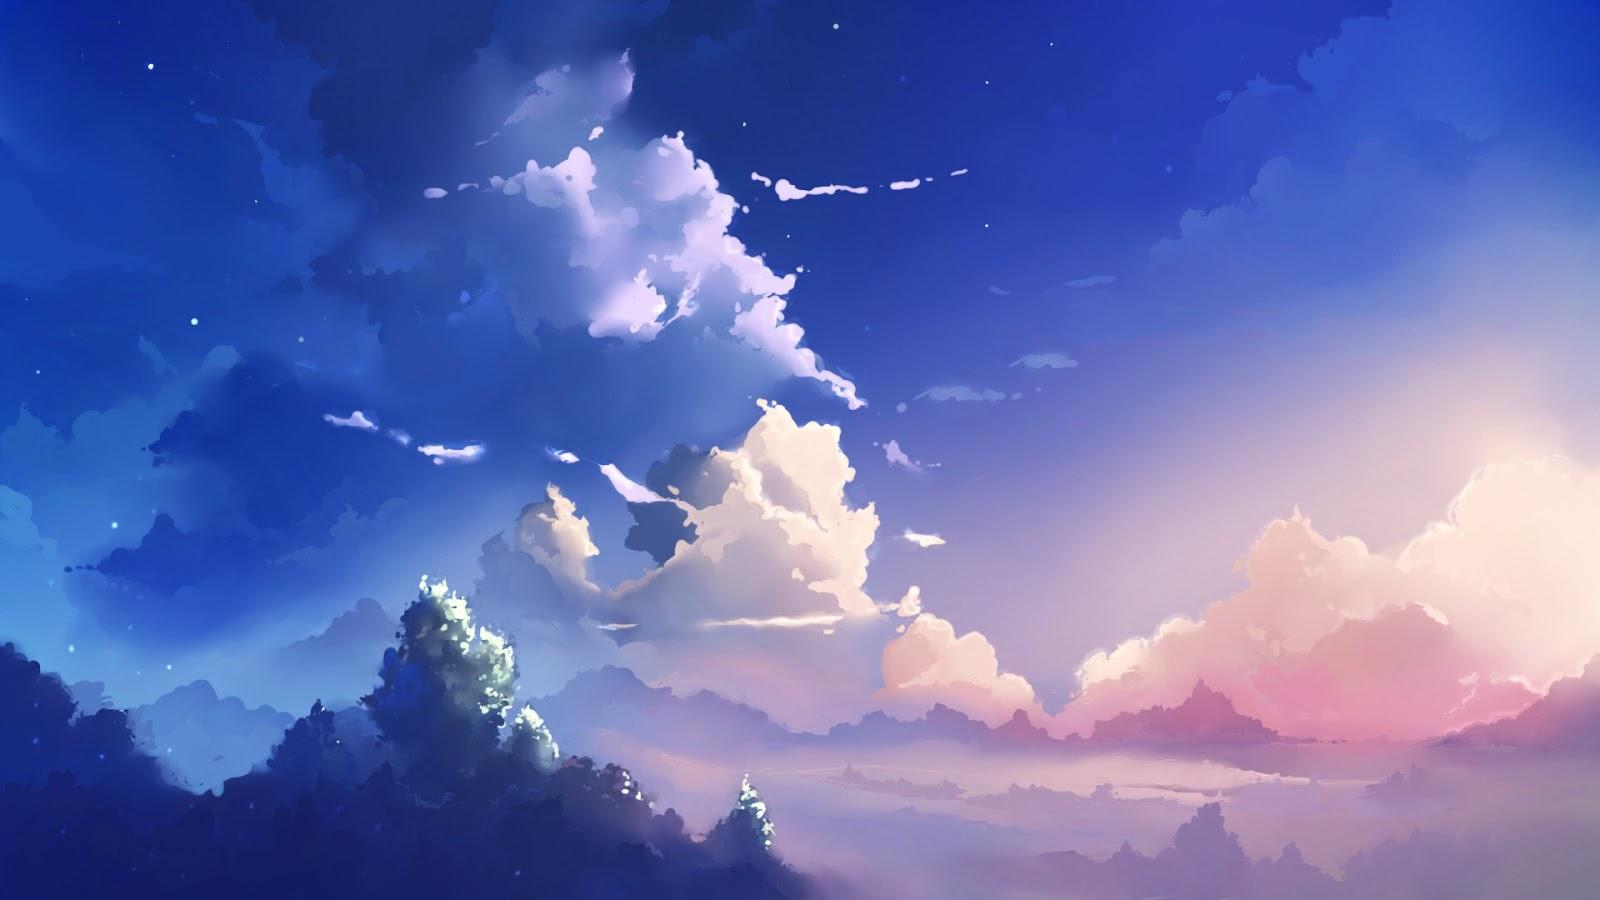 Anime Sky Wallpaper Amazing Wallpapers